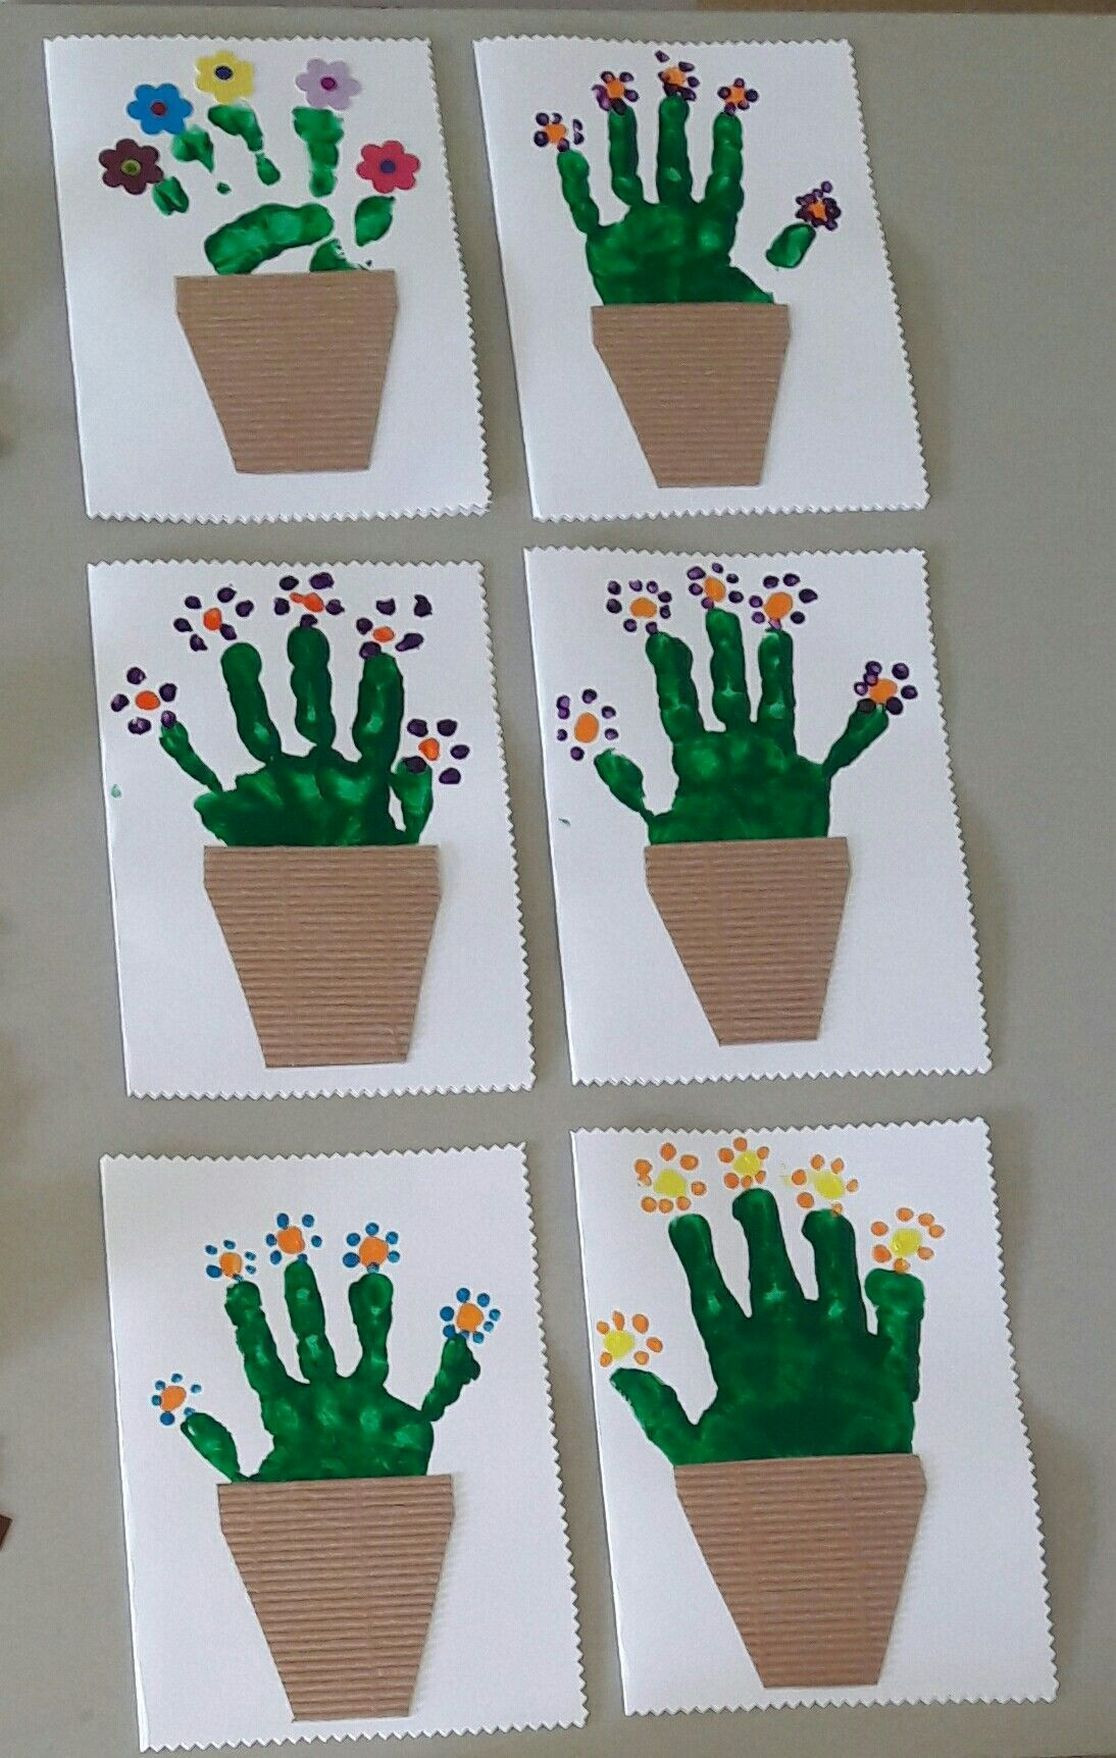 Spring Crafts Preschool  Spring crafts preschool creative art ideas 34